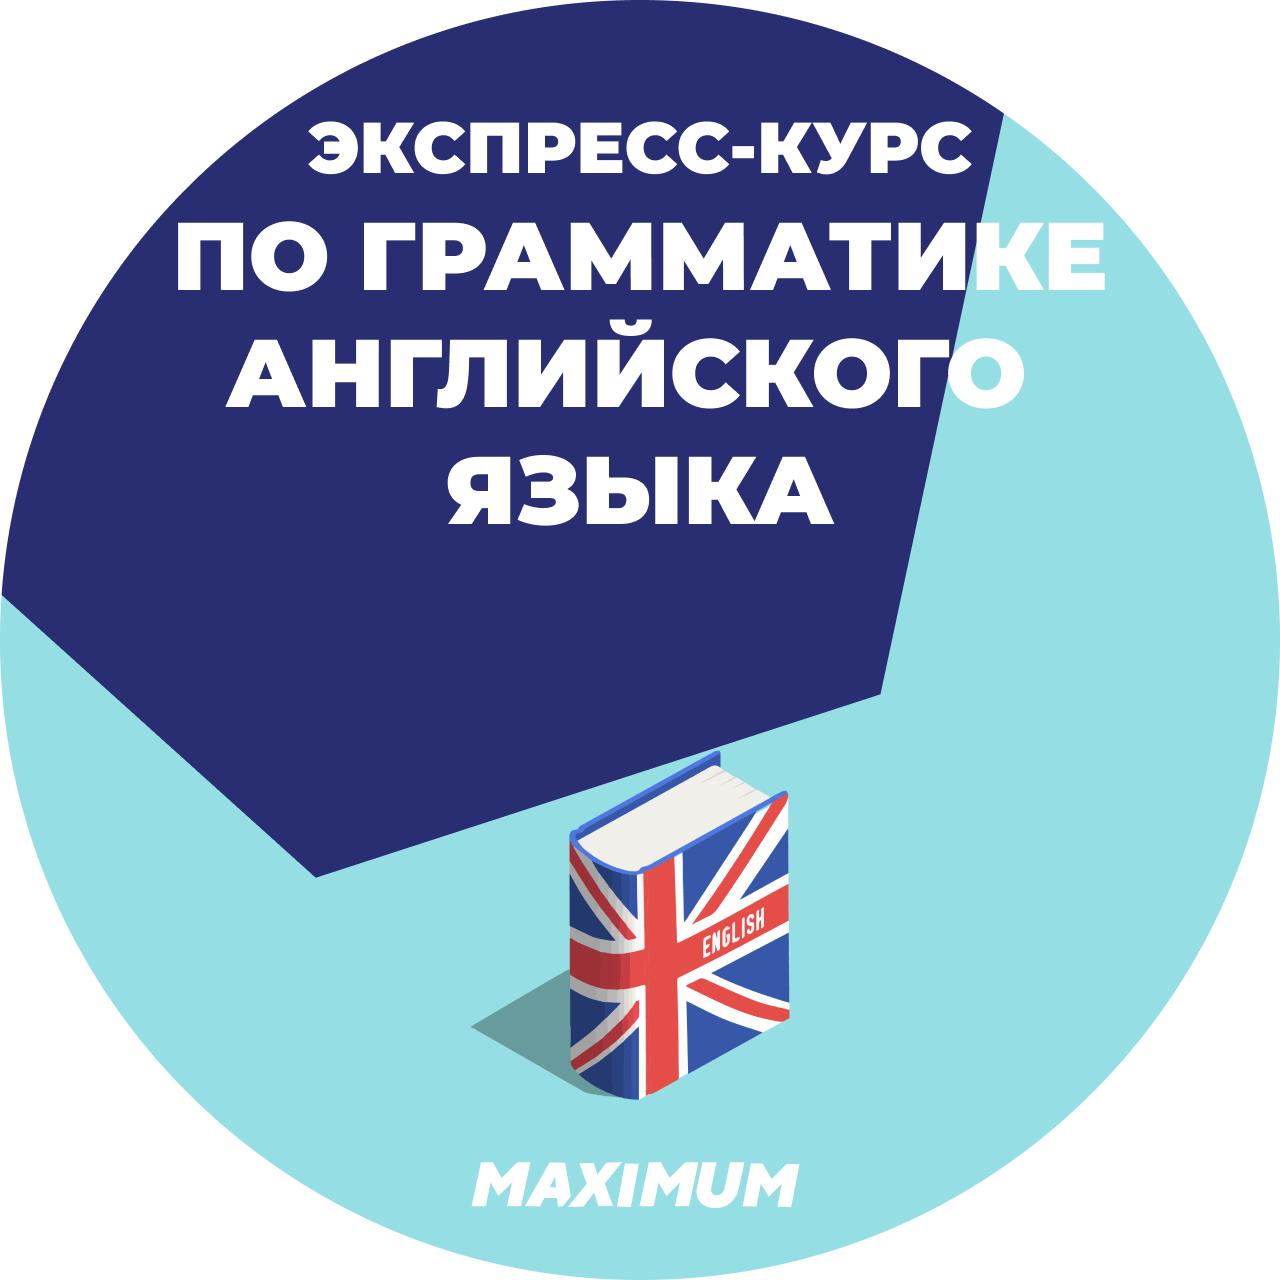 Экспресс-курс по грамматике английского языка